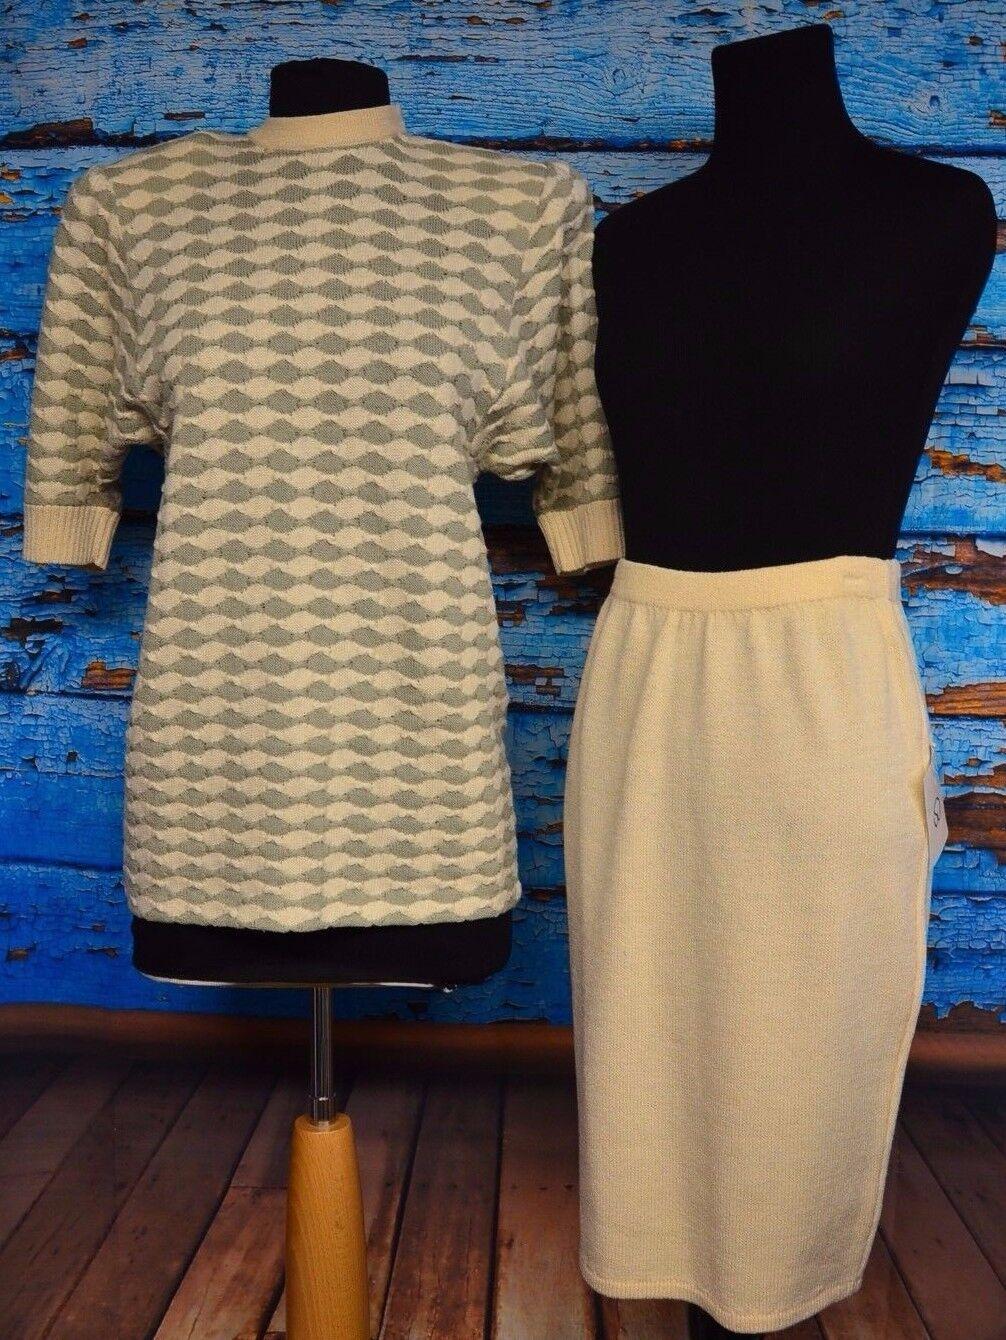 VTG St. John Sz 2 Women's Knit Skirt Suit USA Wool Cotton Bld Parchment Cypress